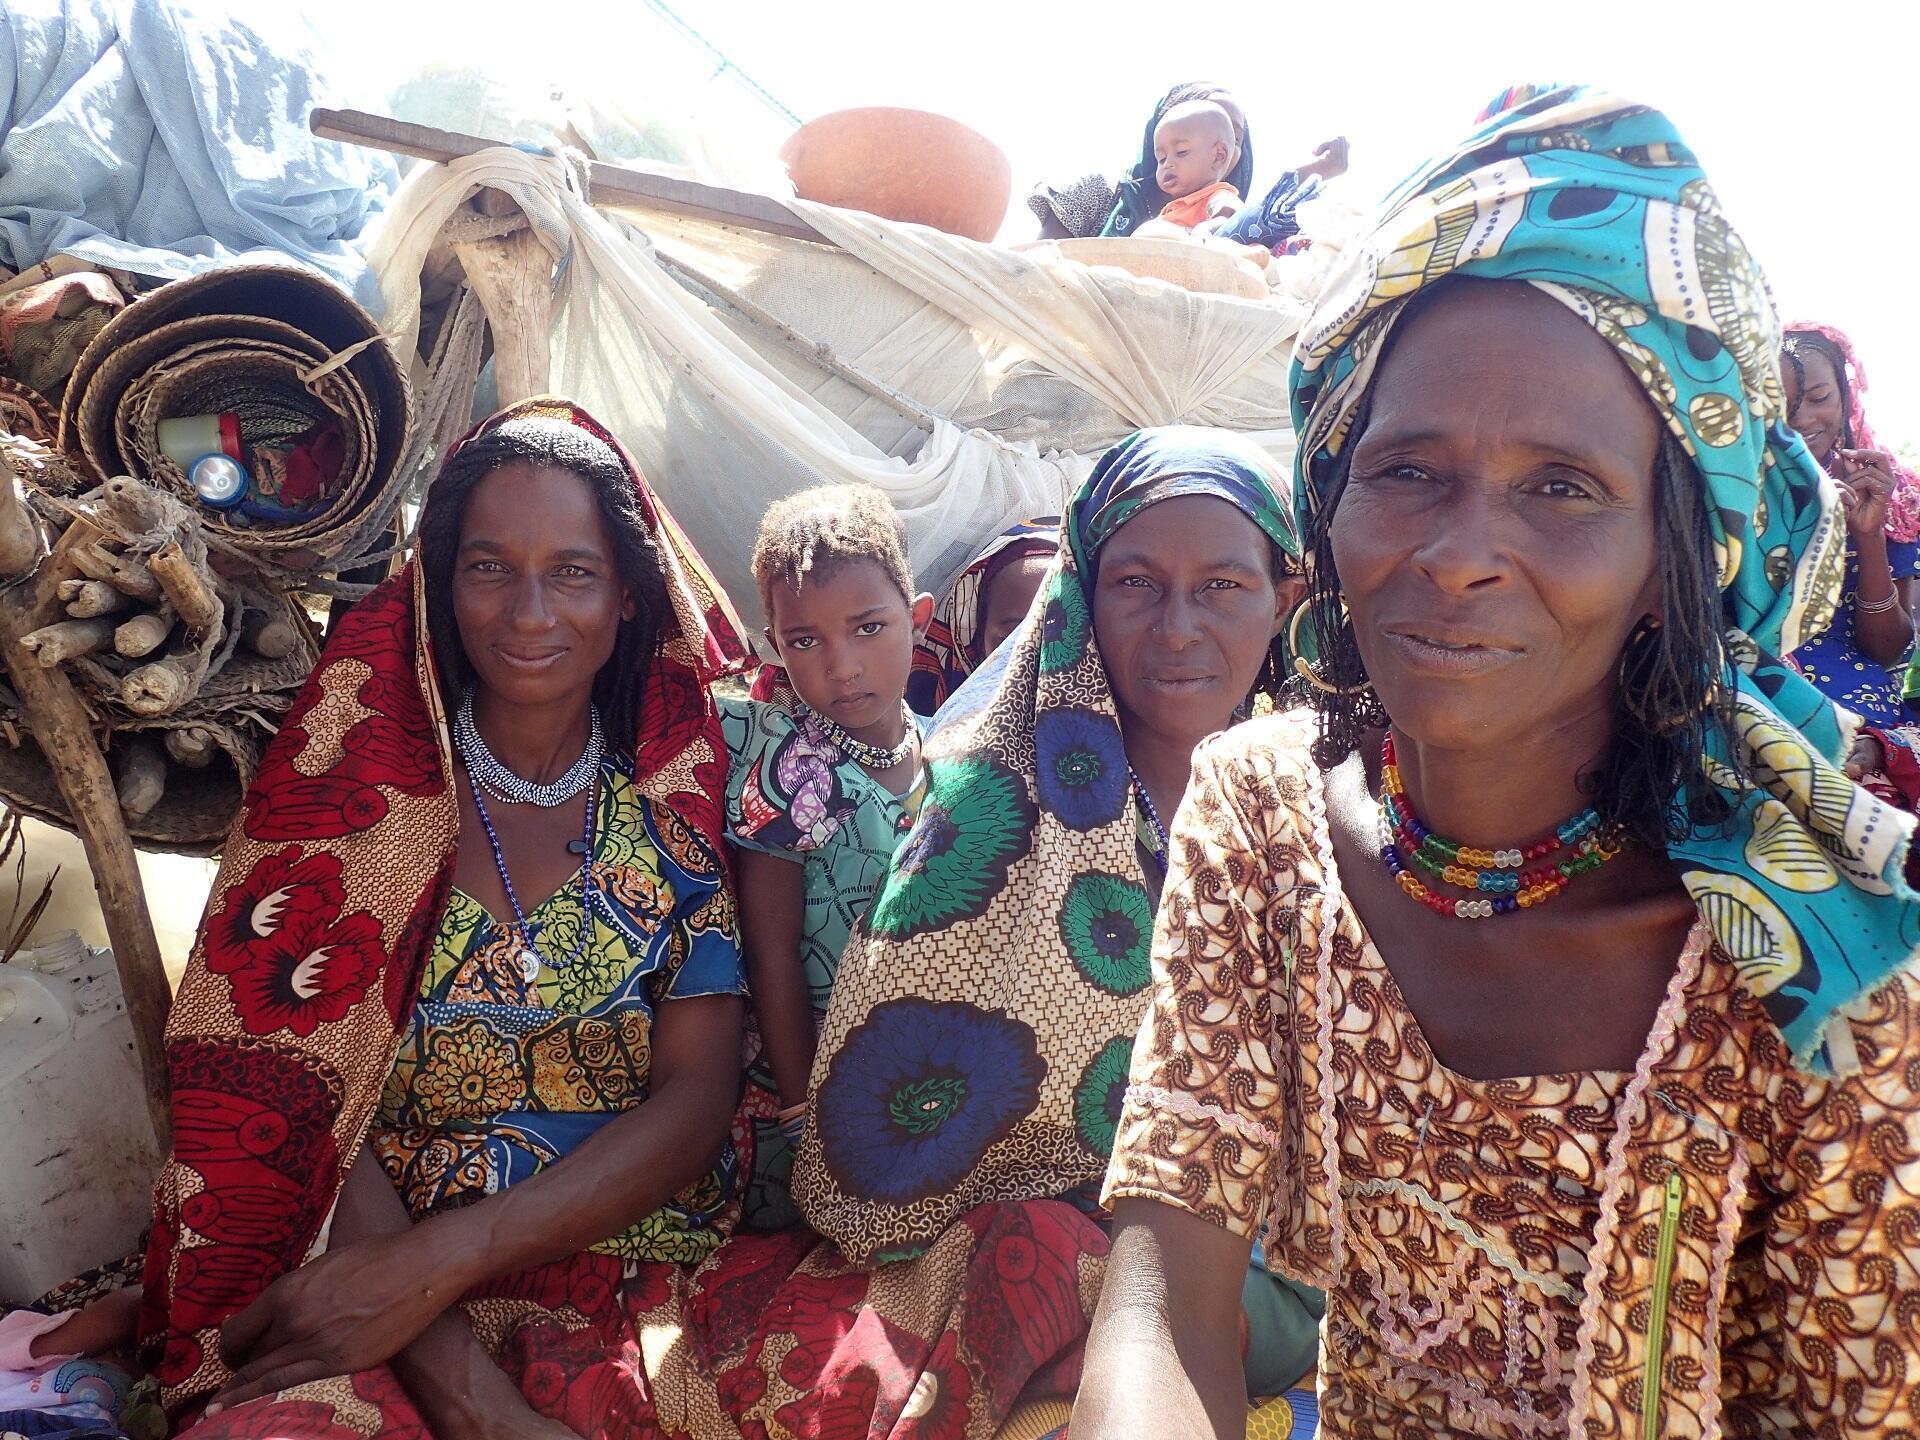 Femmes Peuls M'Bororo  en transhumance vers le lac Tchad